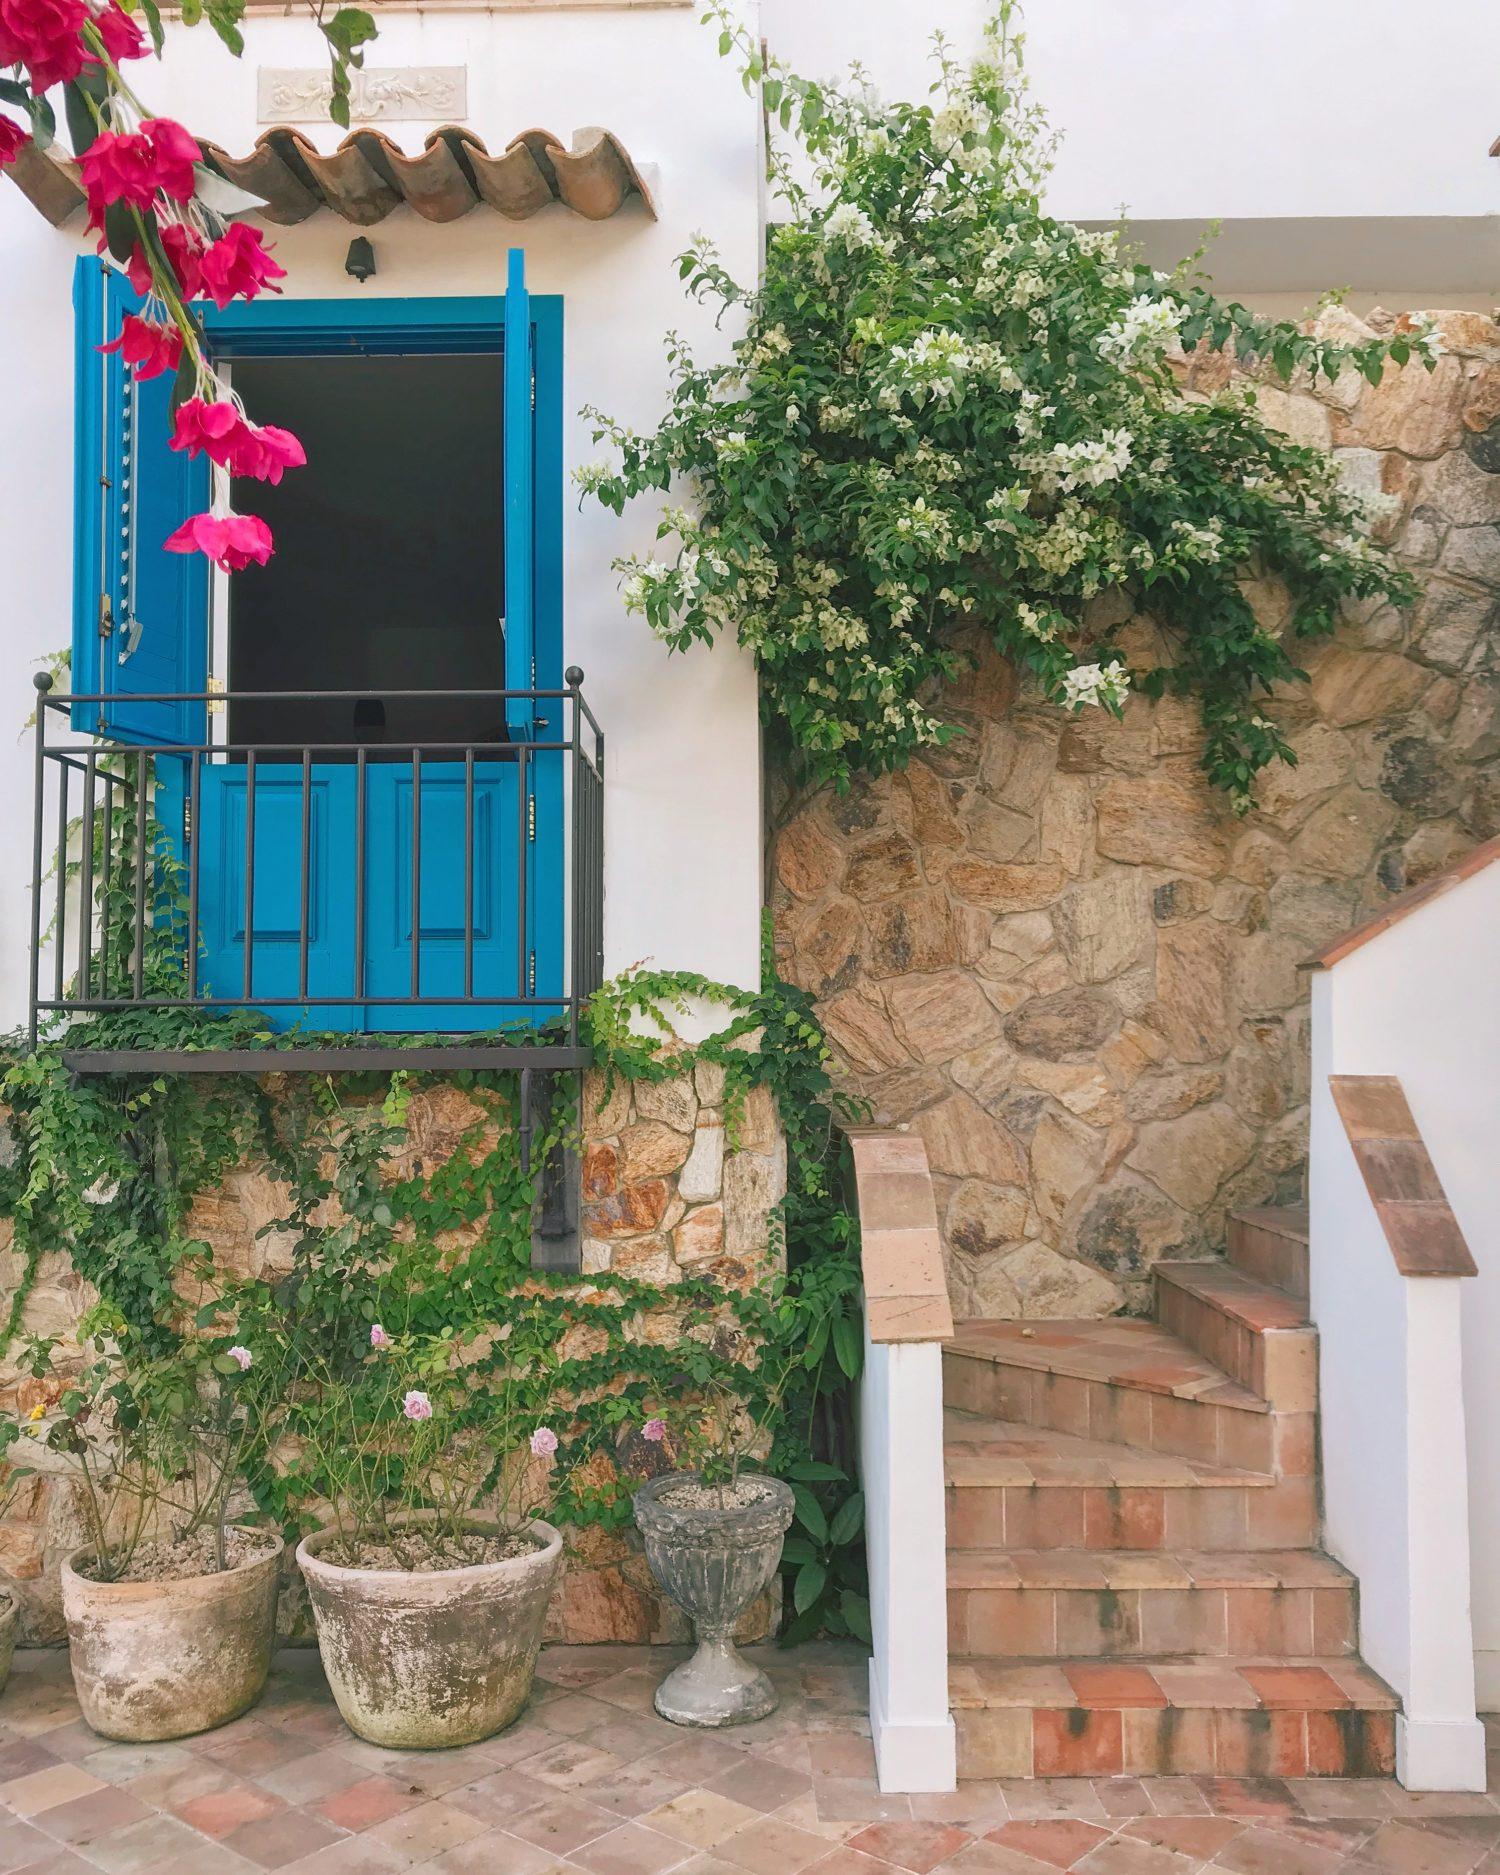 Vila da Santa Hotel em Búzios - onde ficar